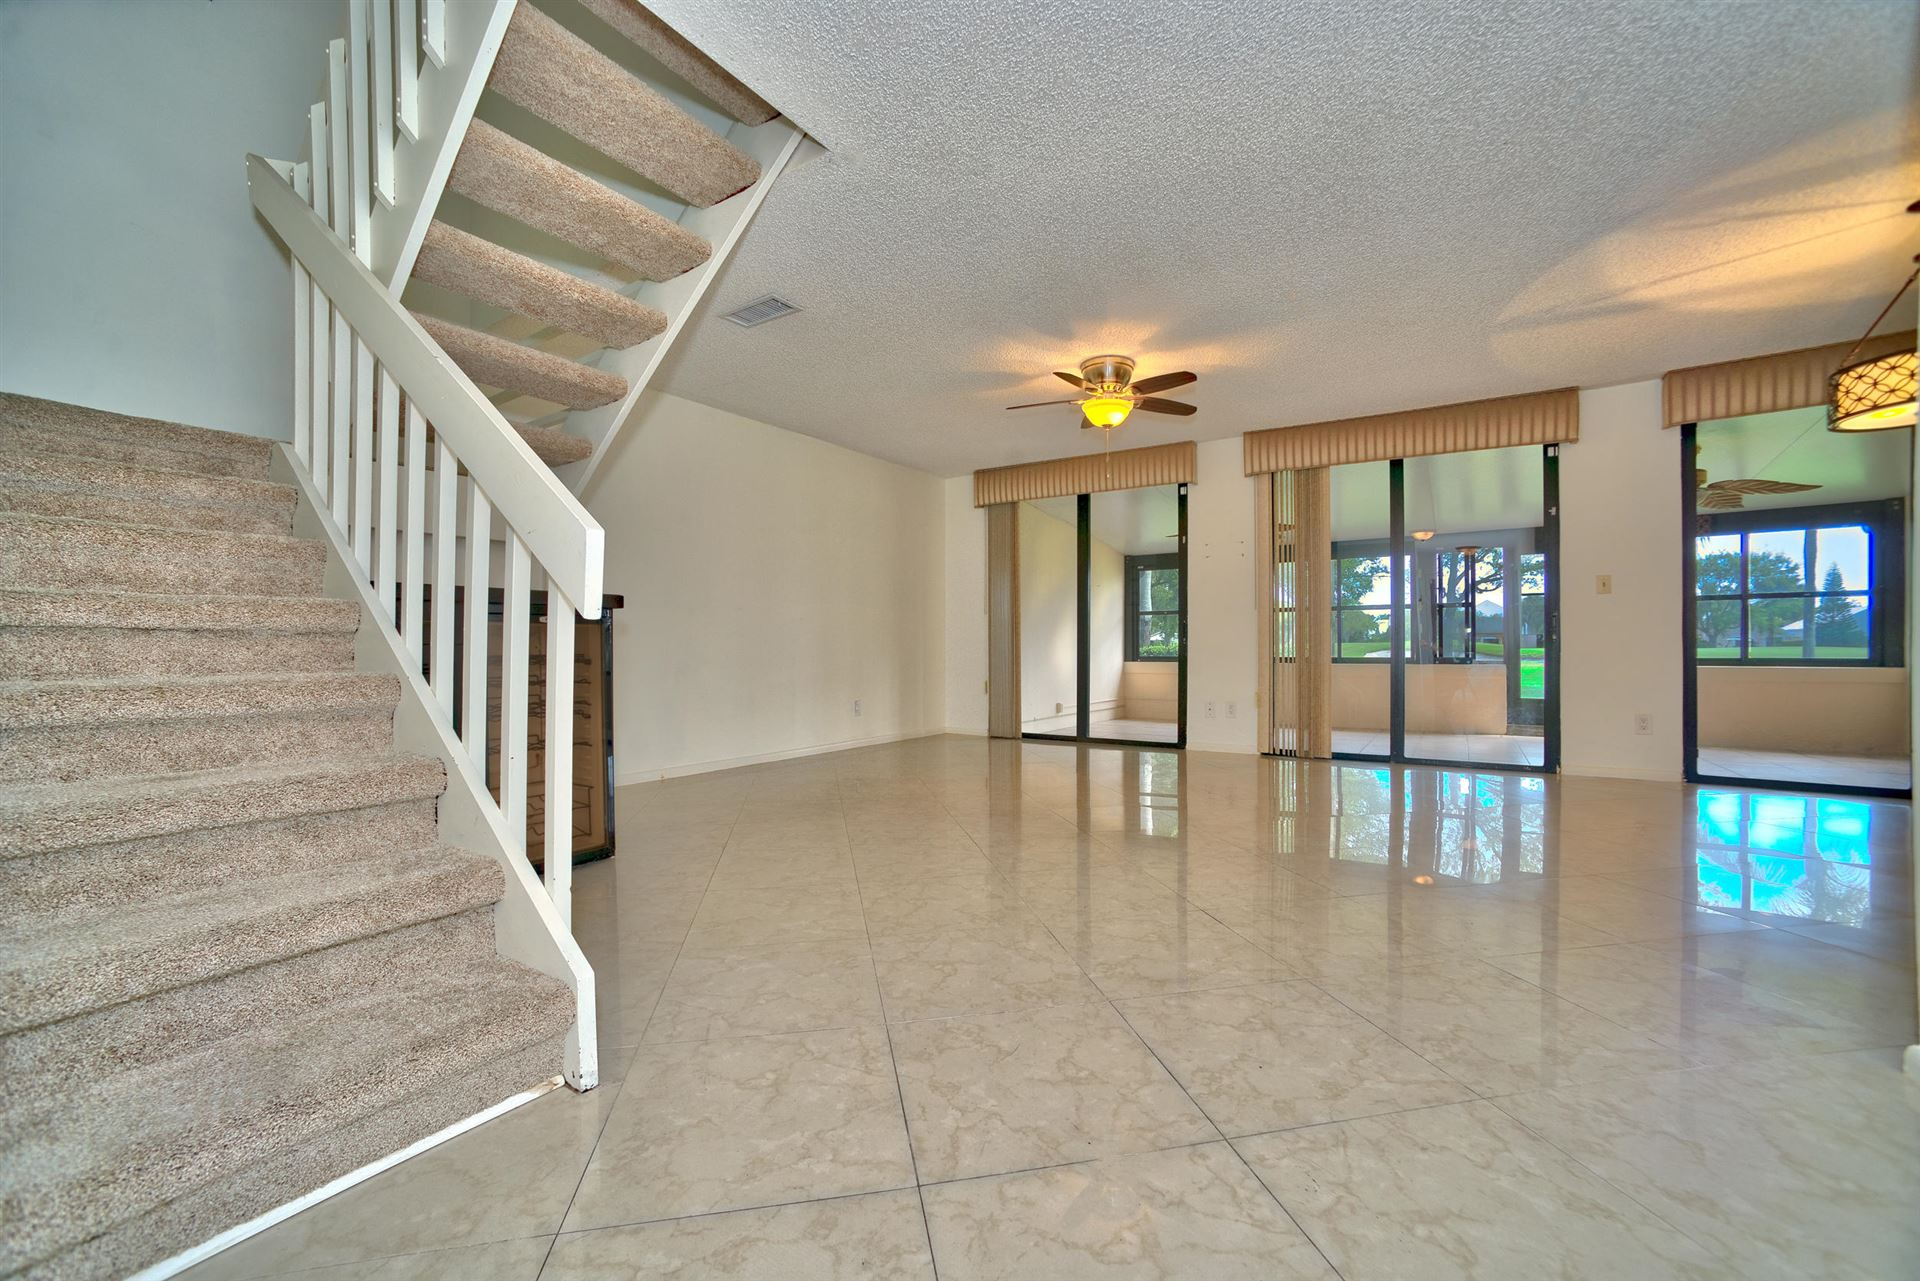 Photo of 806 Windermere Way, Palm Beach Gardens, FL 33418 (MLS # RX-10658687)